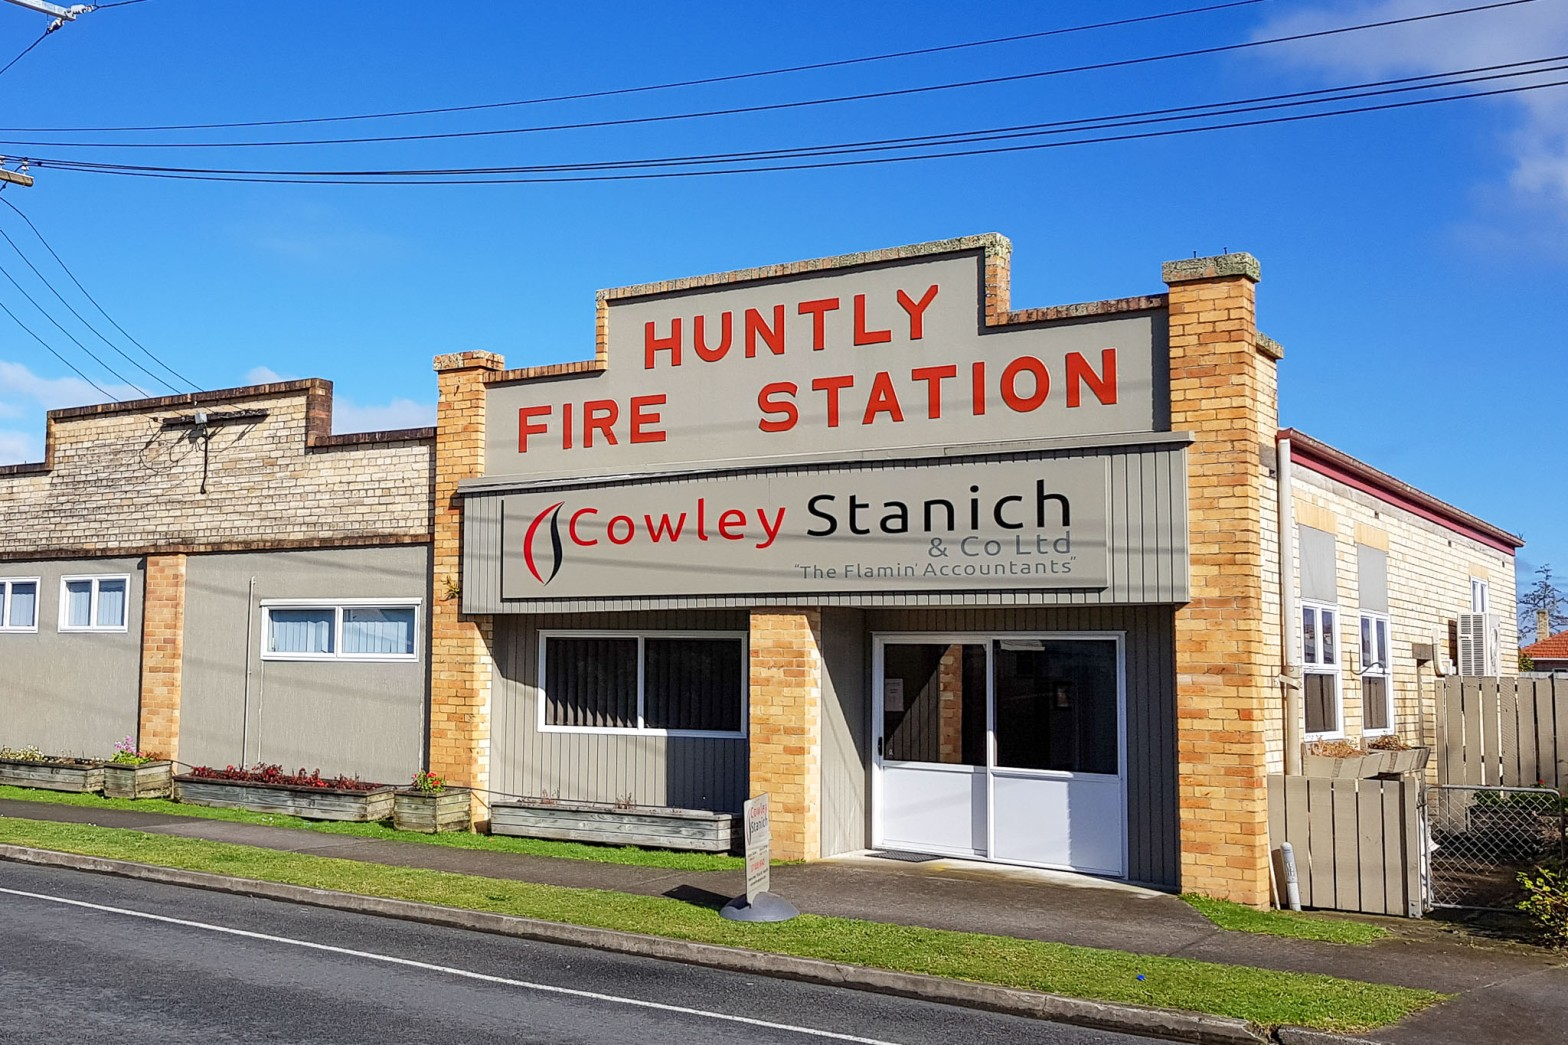 Cowley Stanich & Co Ltd, Huntly Fire Station, 9 Hakanoa Street, Huntly, Waikato. 2018-08-06-Monday